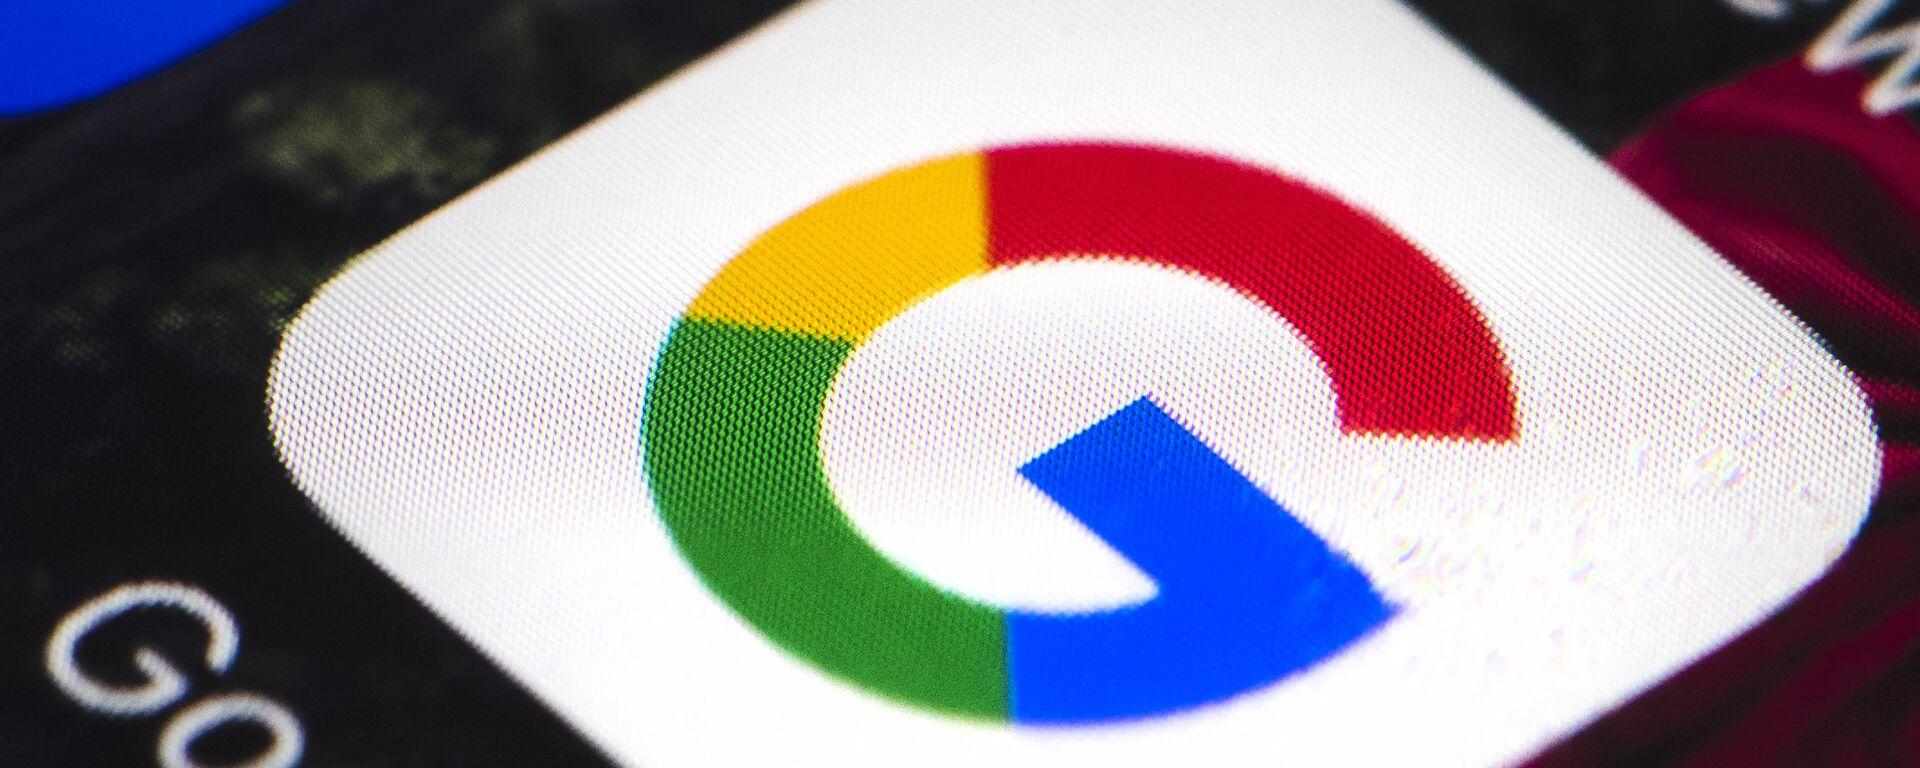 Logo de Google (archivo) - Sputnik Mundo, 1920, 14.01.2021